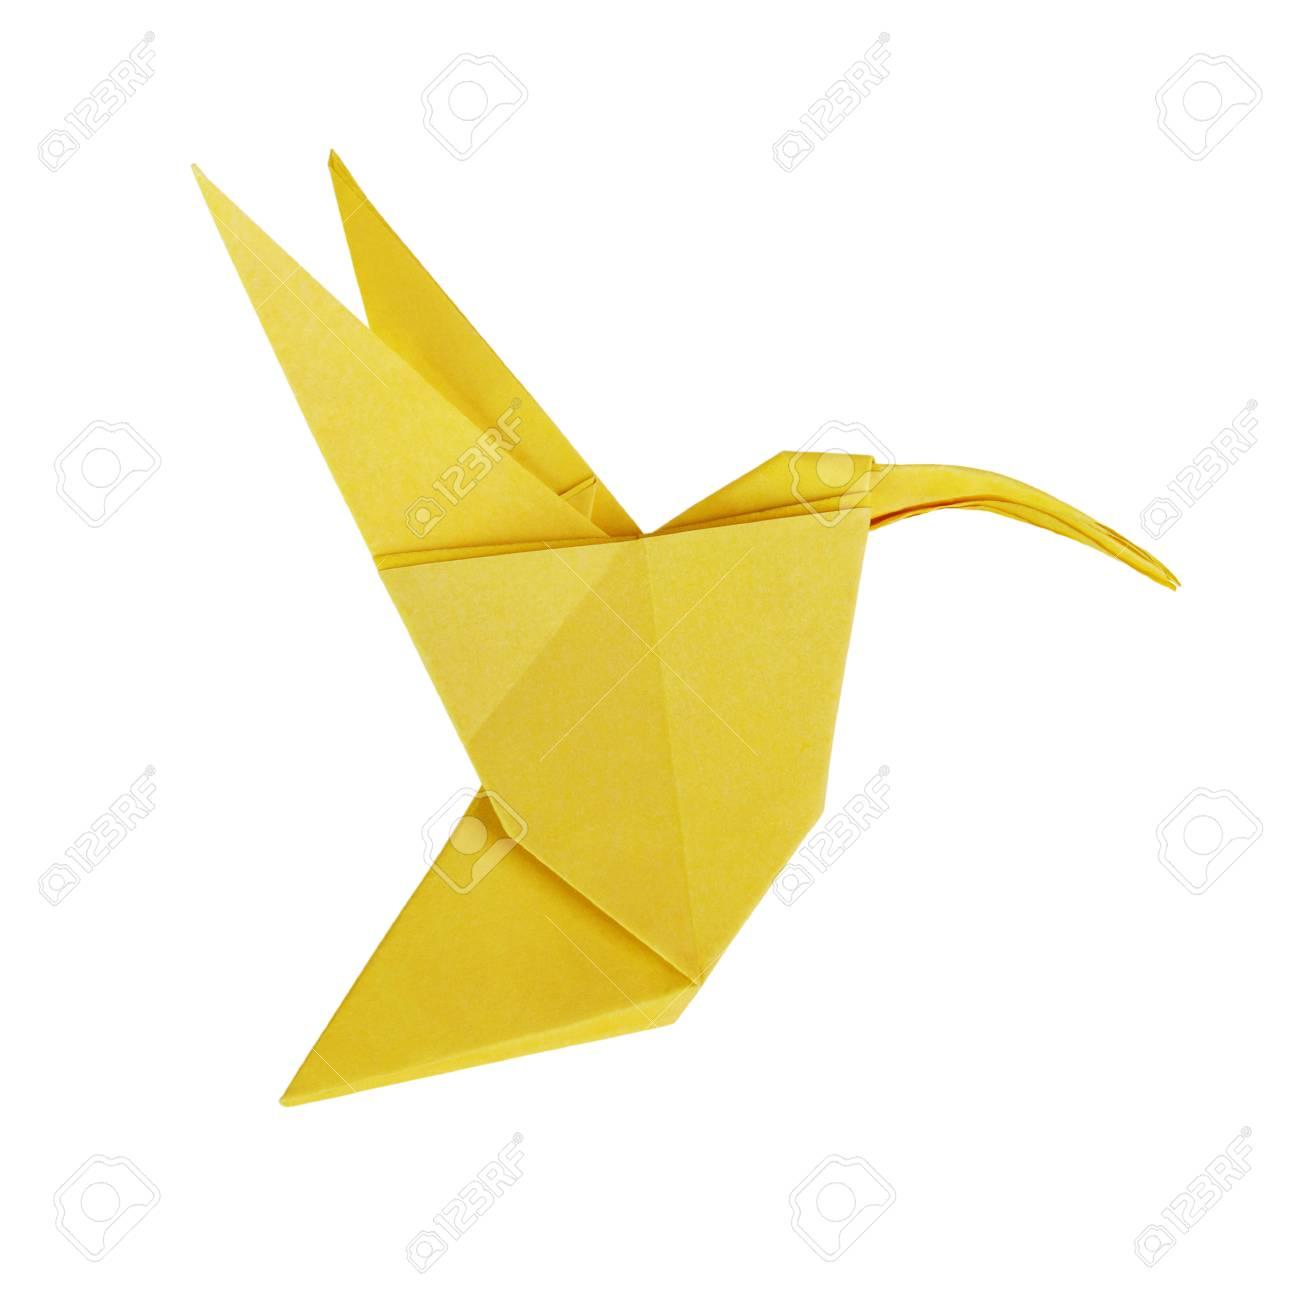 10 Amazing Flowers Origami Art – DIY Tutorials Videos in 2020 ... | 1300x1299